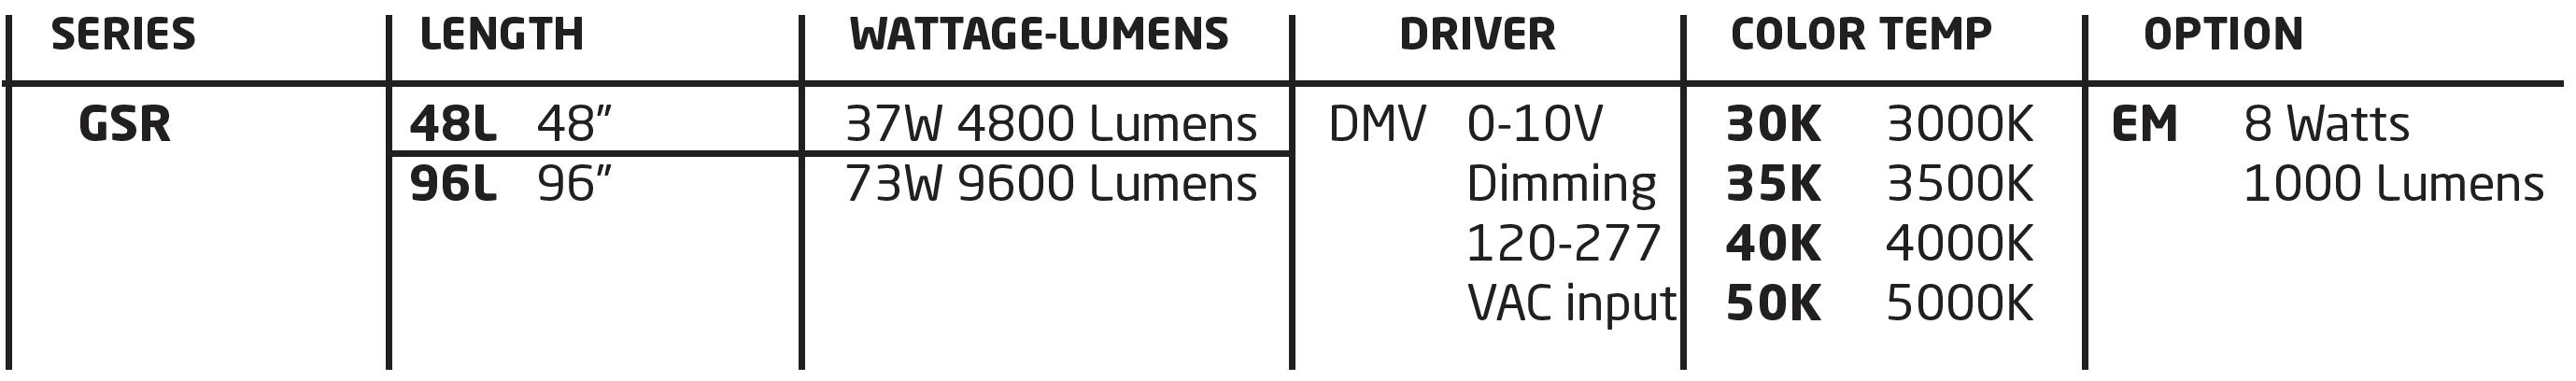 GSR LED Ordering Guide